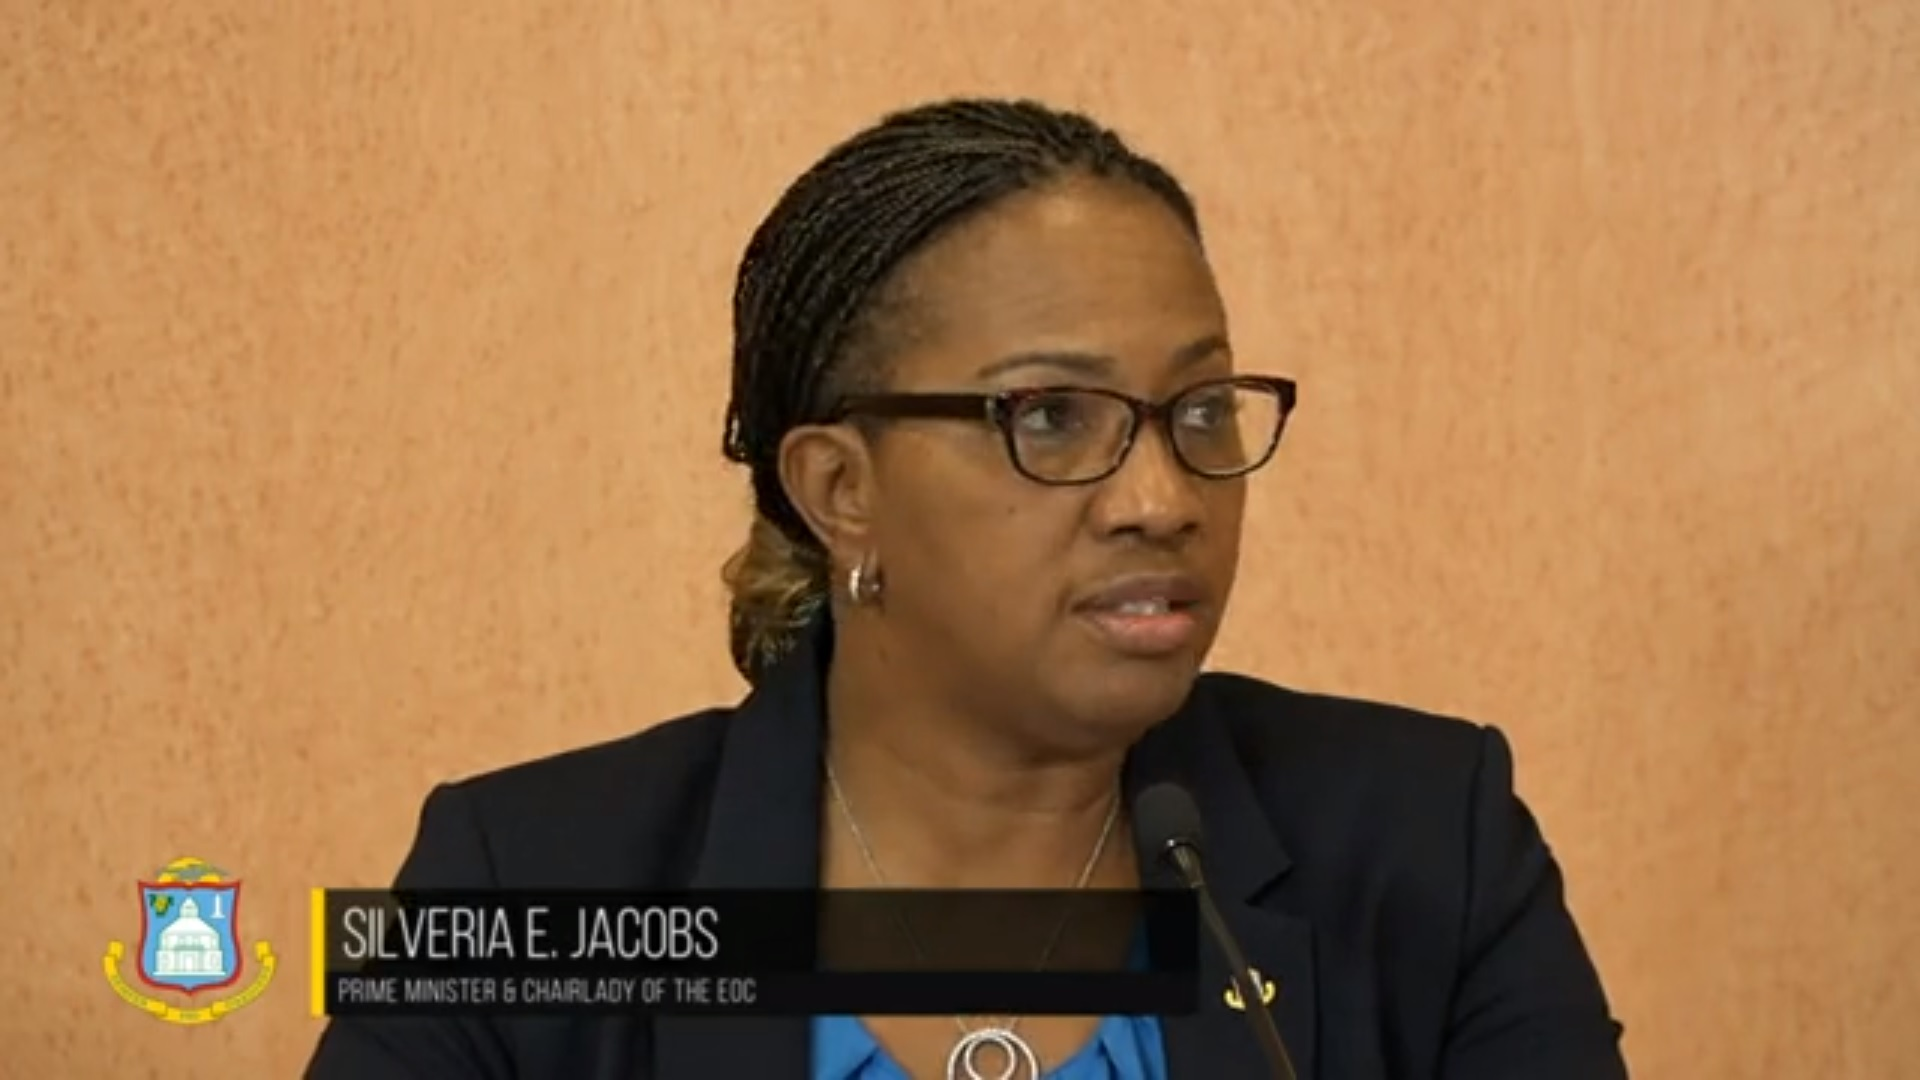 PM Silveria Jacobs National Address - 2020040403